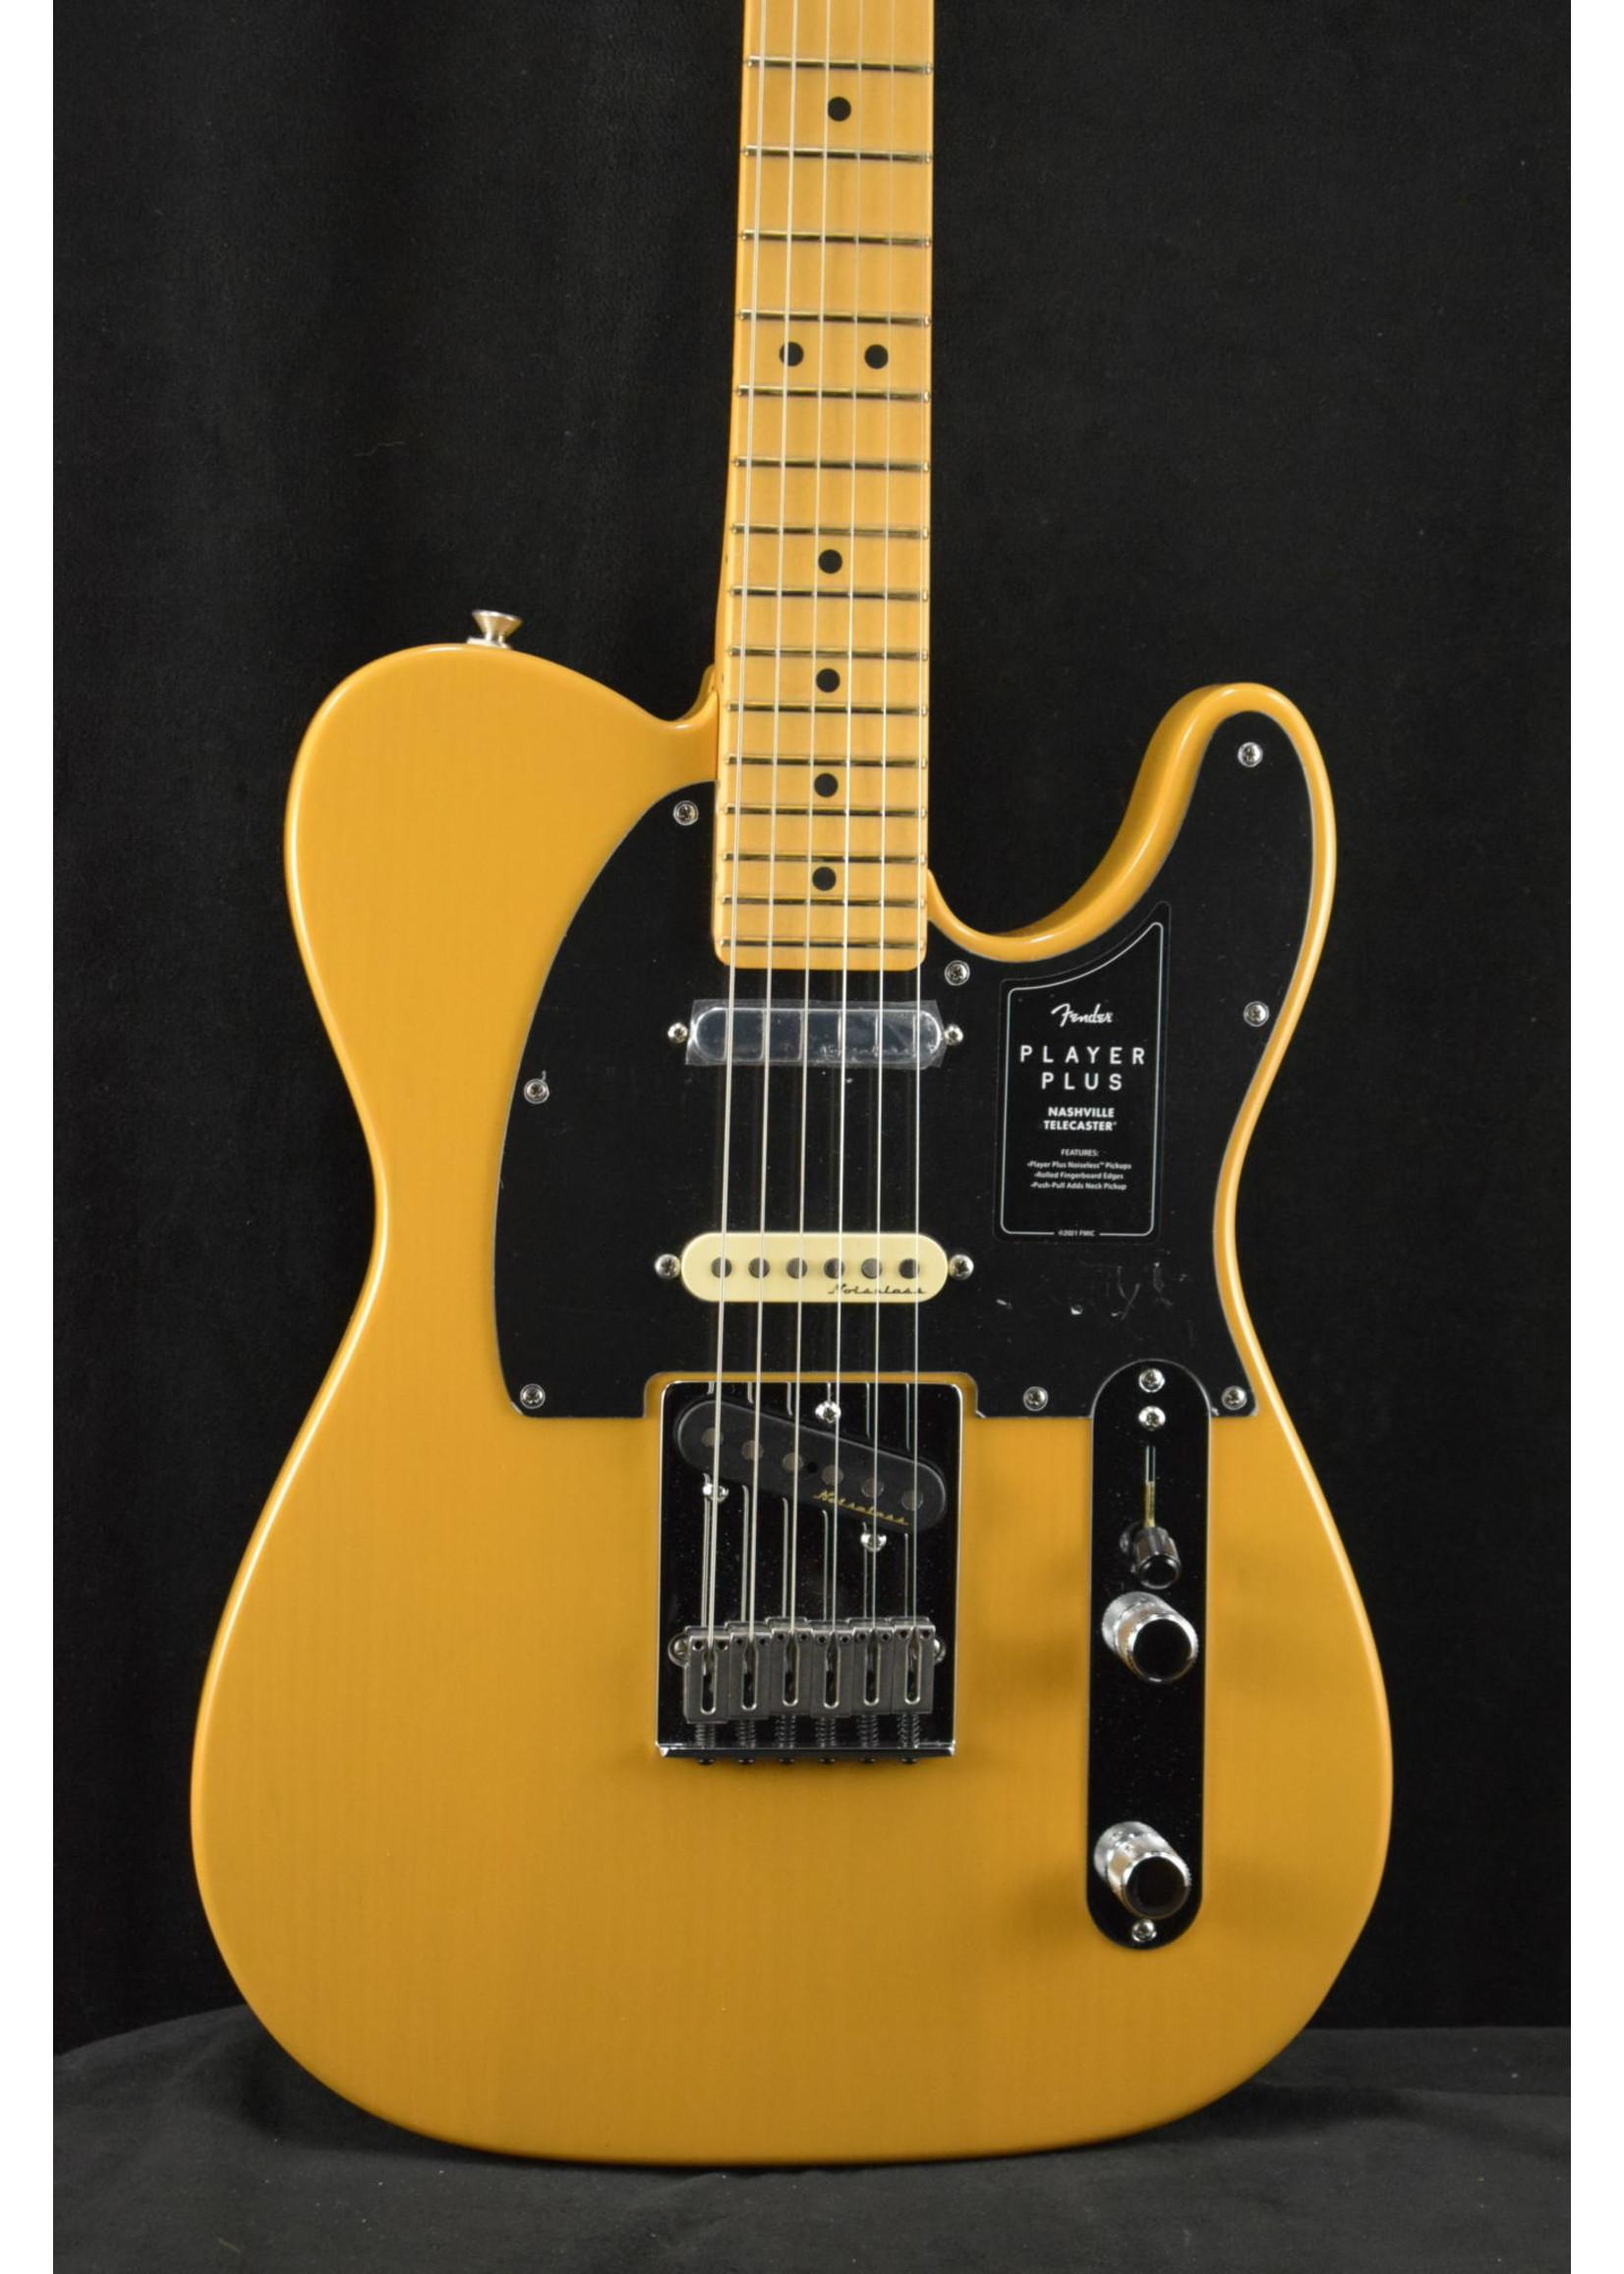 Fender Fender Player Plus Nashville Telecaster Maple Fingerboard Butterscotch Blonde